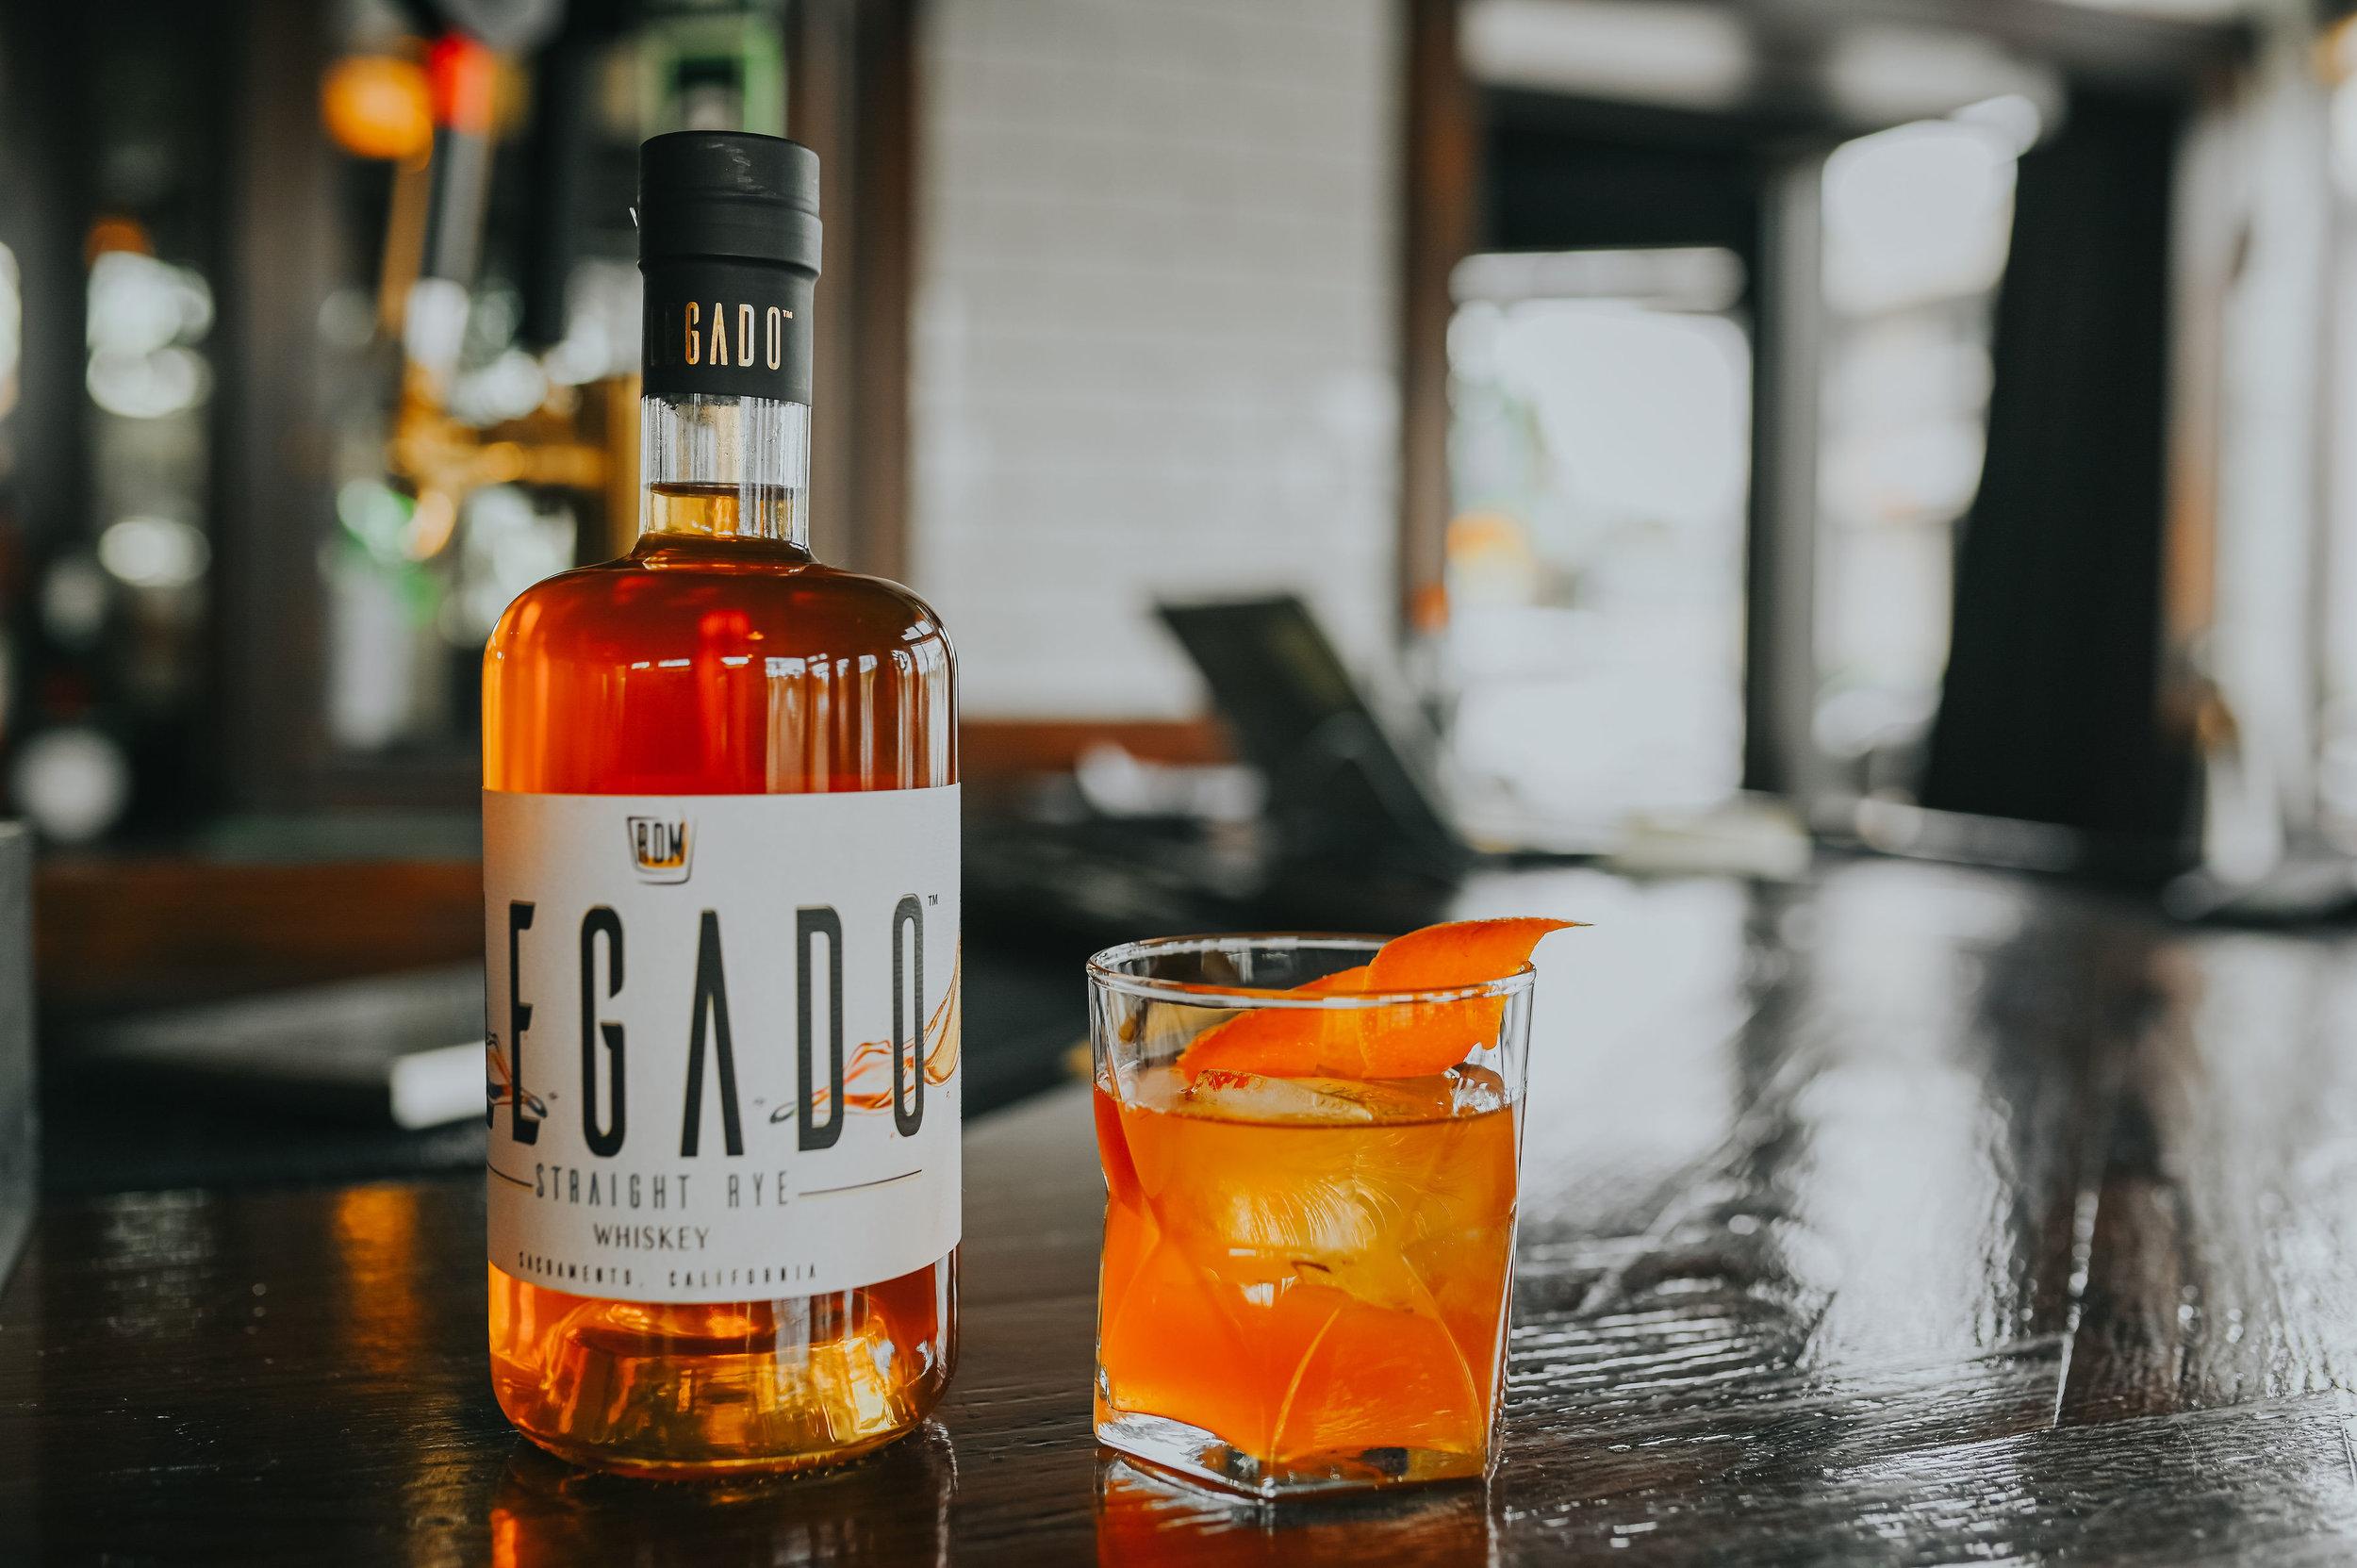 Sacramento's First Women Owned Whisky Distillery Sacramento, CA